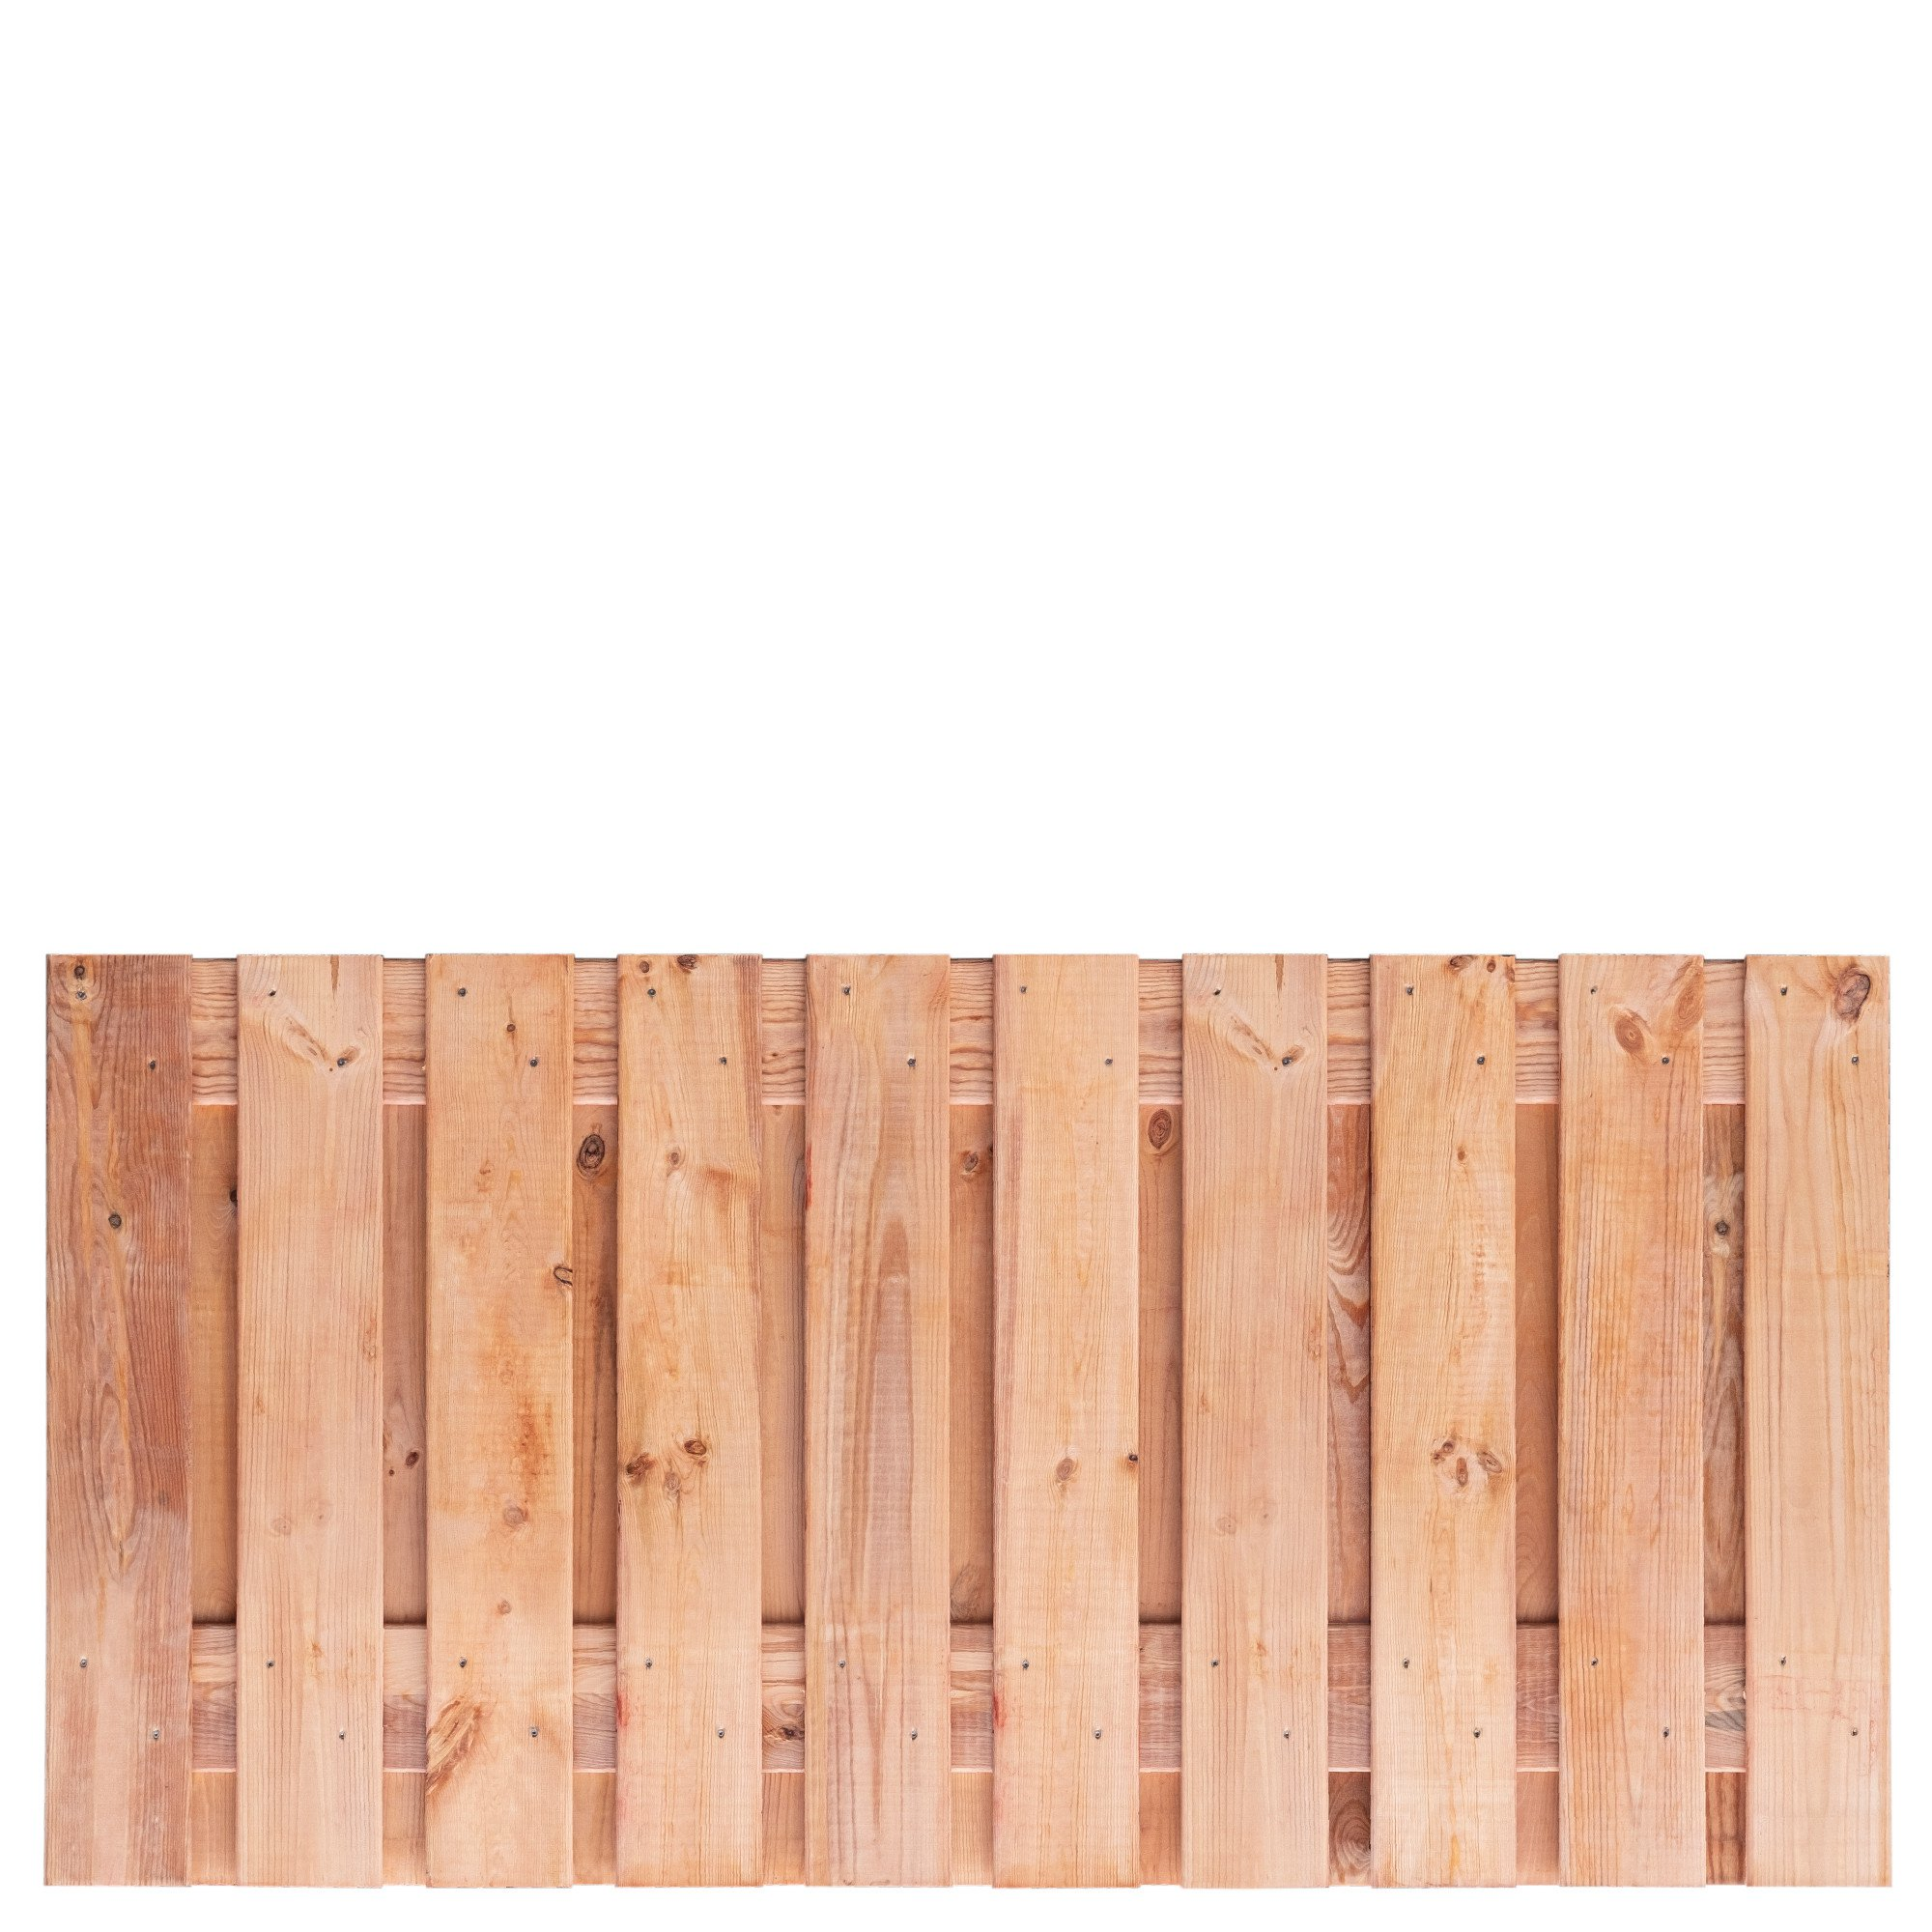 Red Class Wood schutting 90 x 180 cm. Type: Casablanca 90